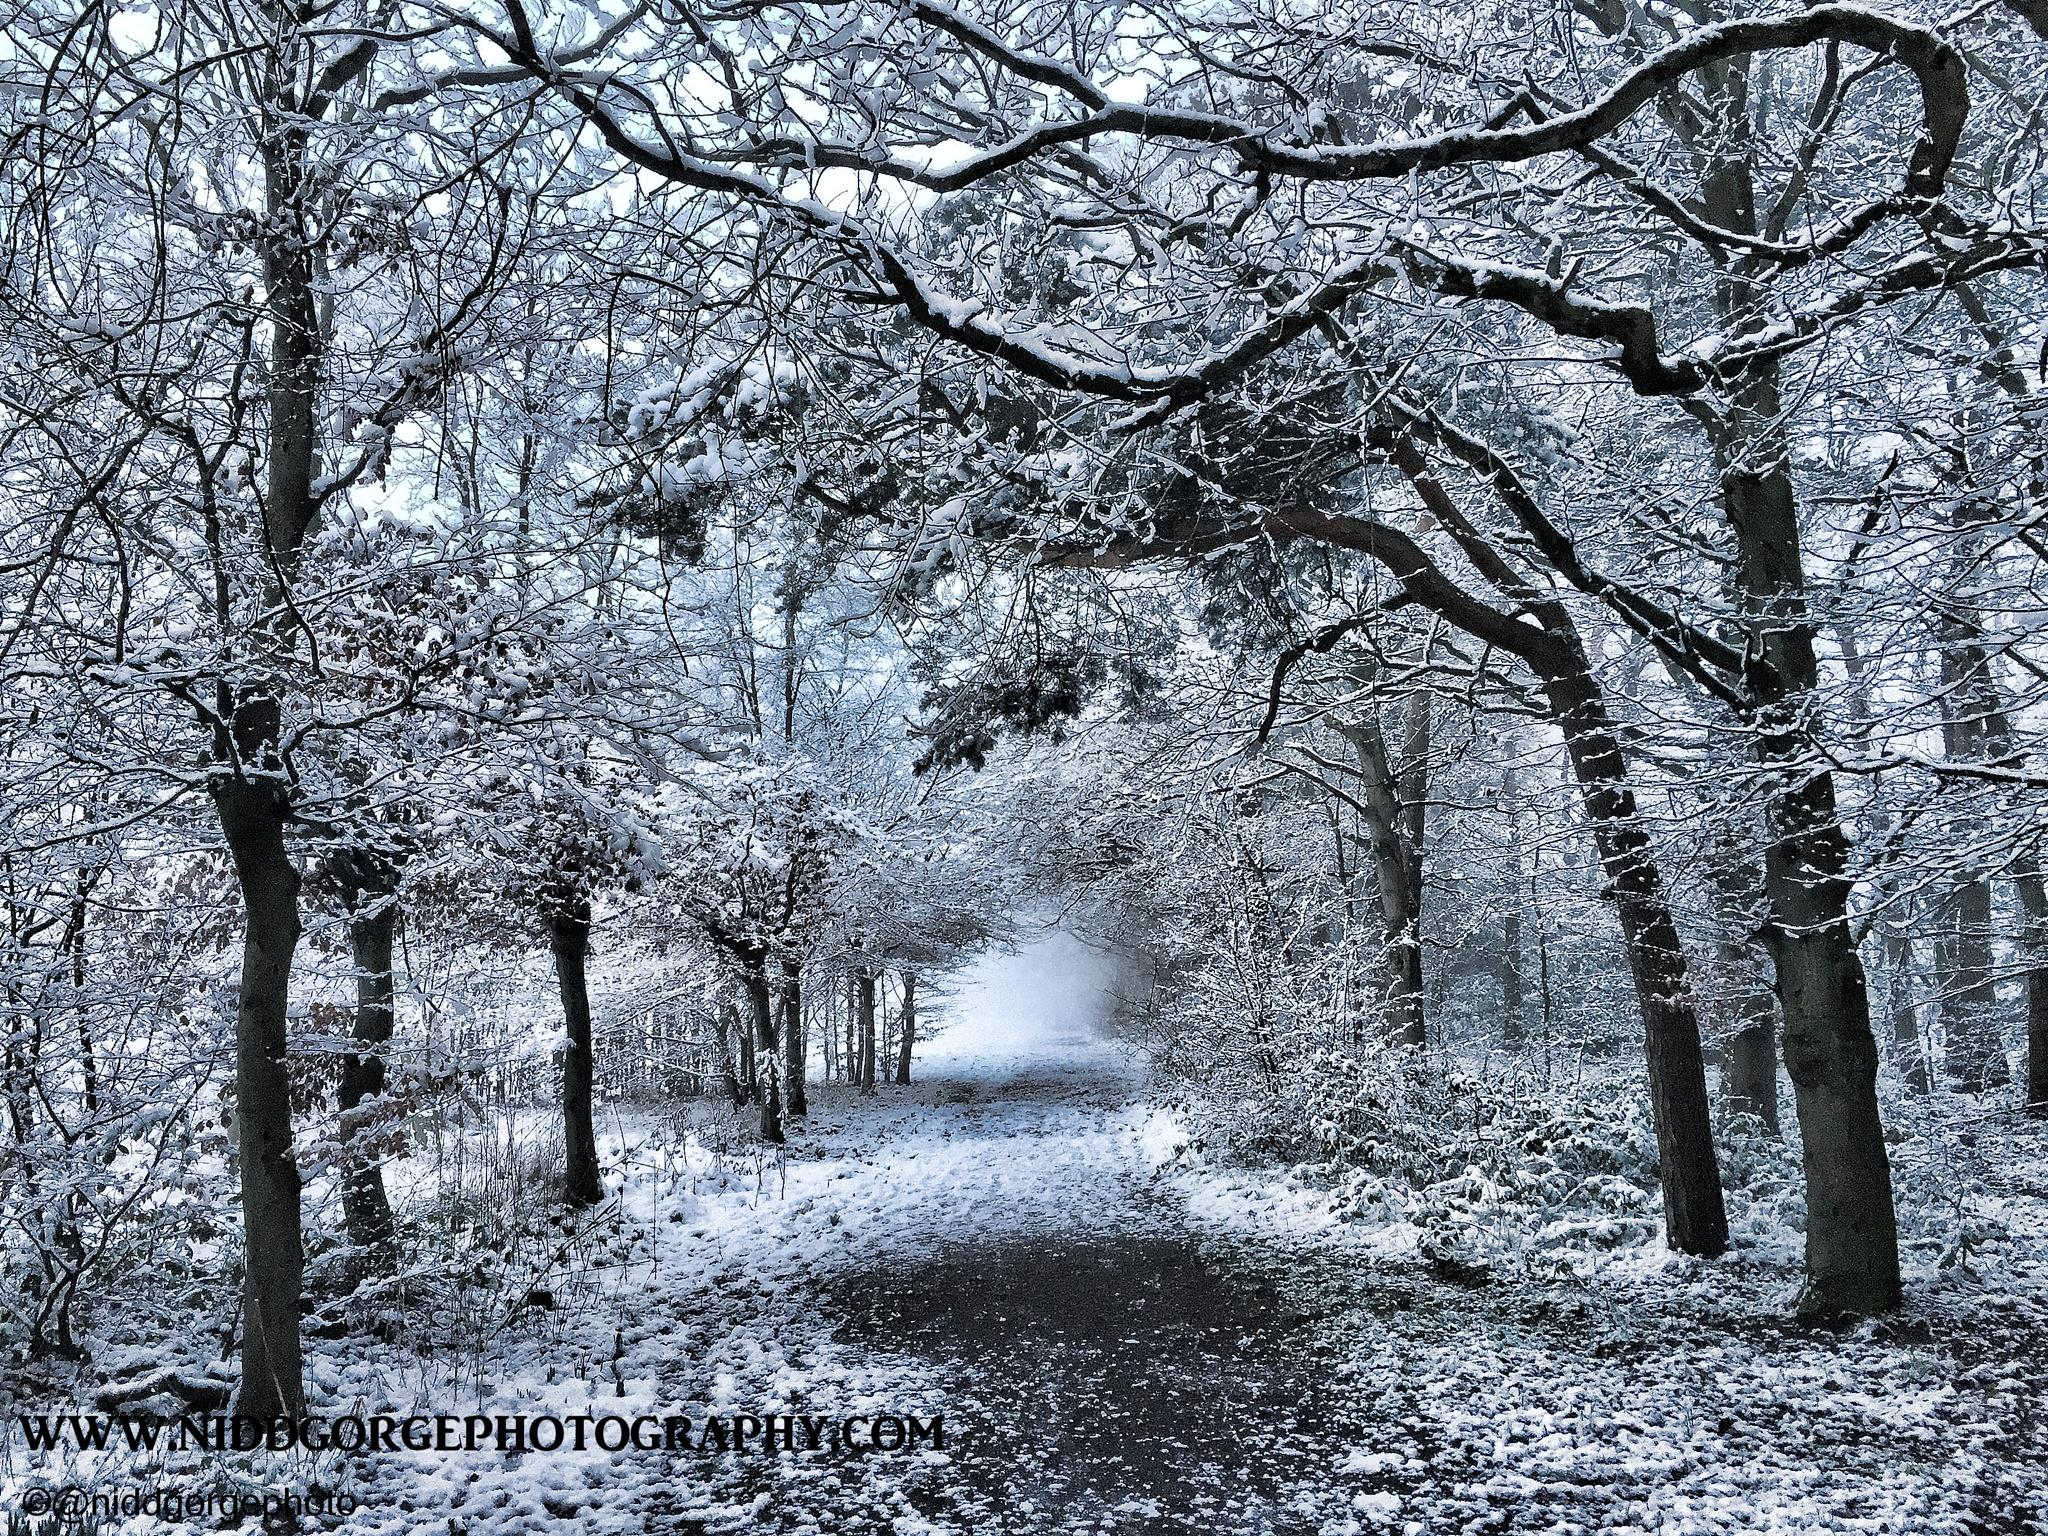 Walking in a winter wonderland. by Niddgorgephoto